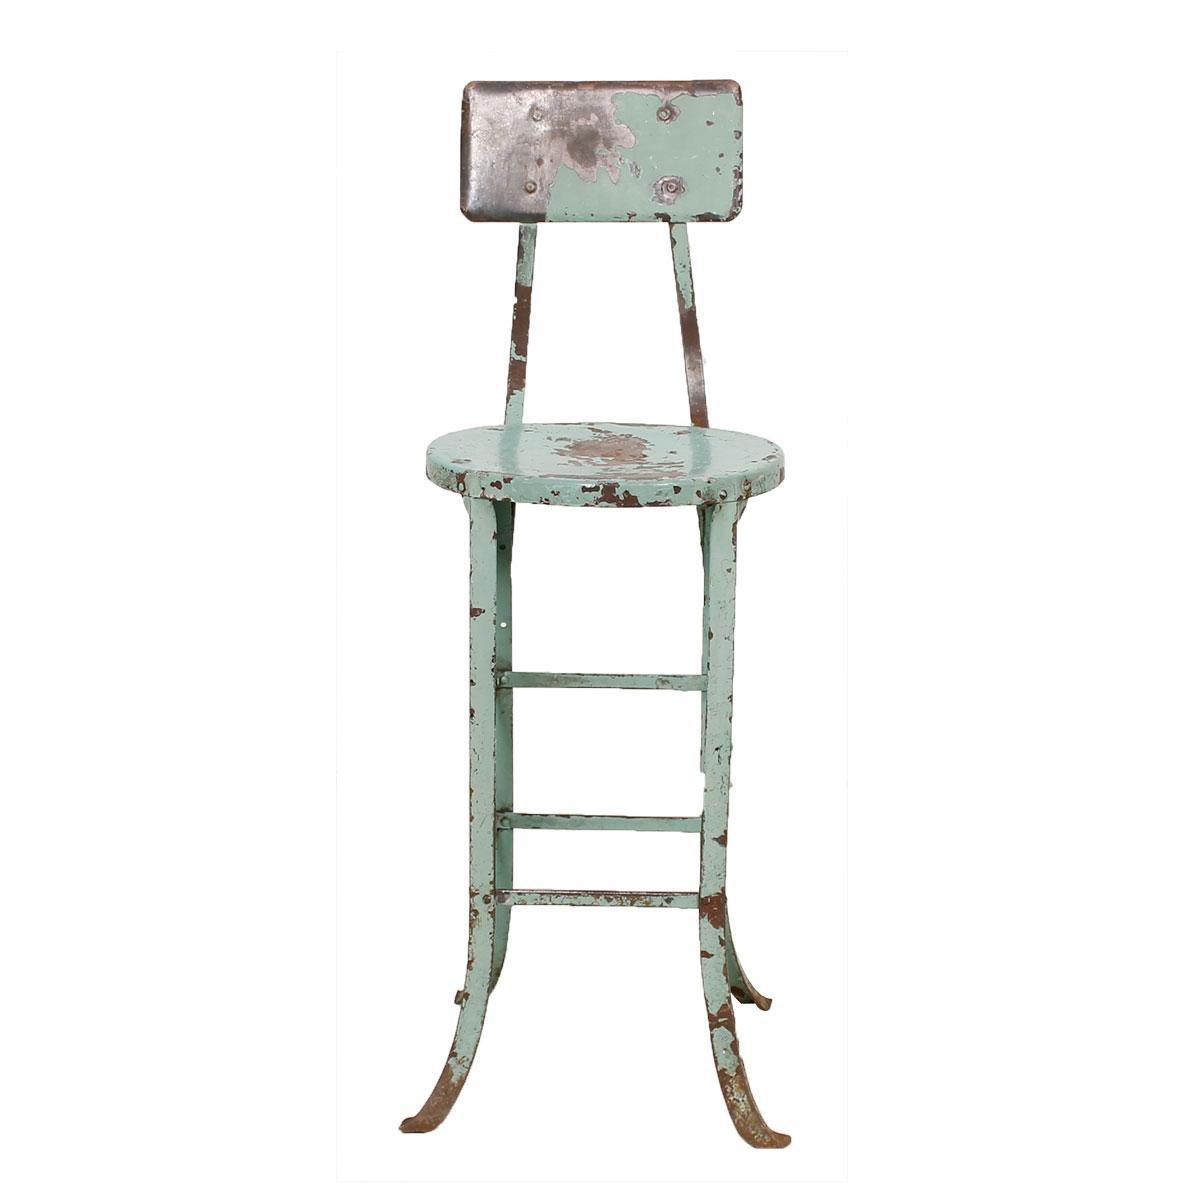 Vintage Industrial Rustic Green Bar Stool Chairish : 146cd217 5a59 41f9 aadf c3e4aa331a79aspectfitampwidth640ampheight640 from www.chairish.com size 640 x 640 jpeg 23kB